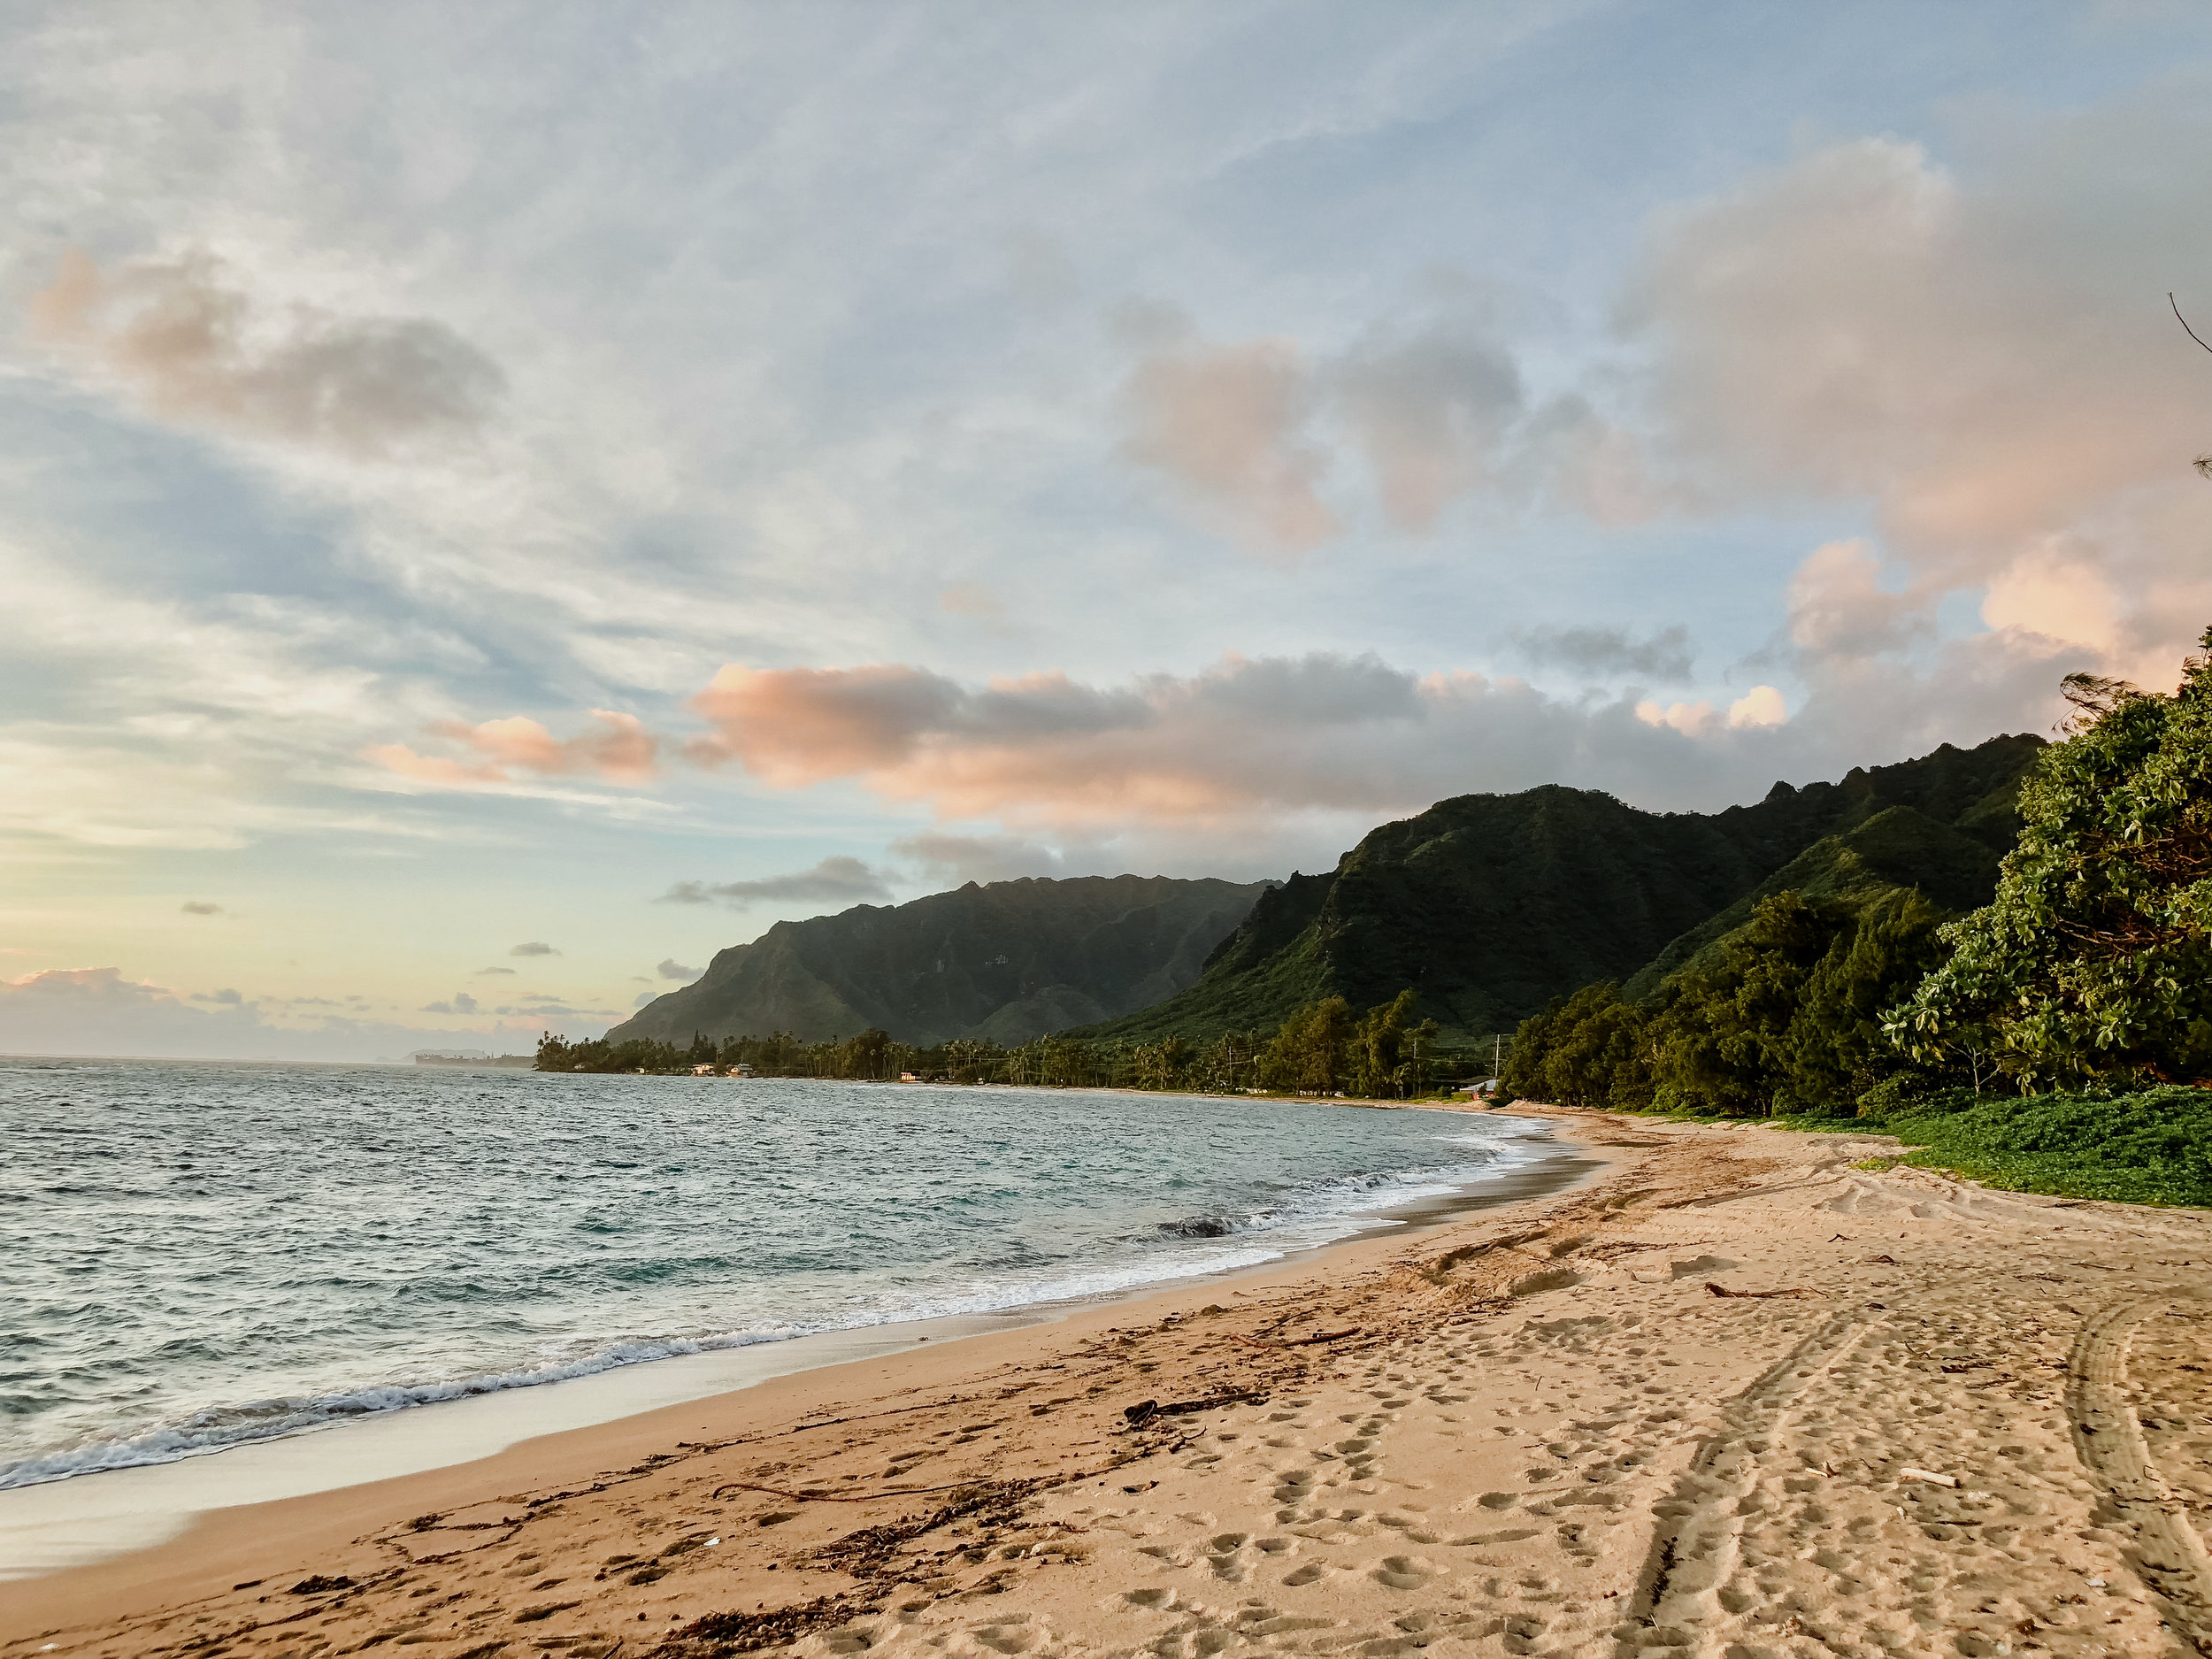 meagans hawaii pics-16.jpg